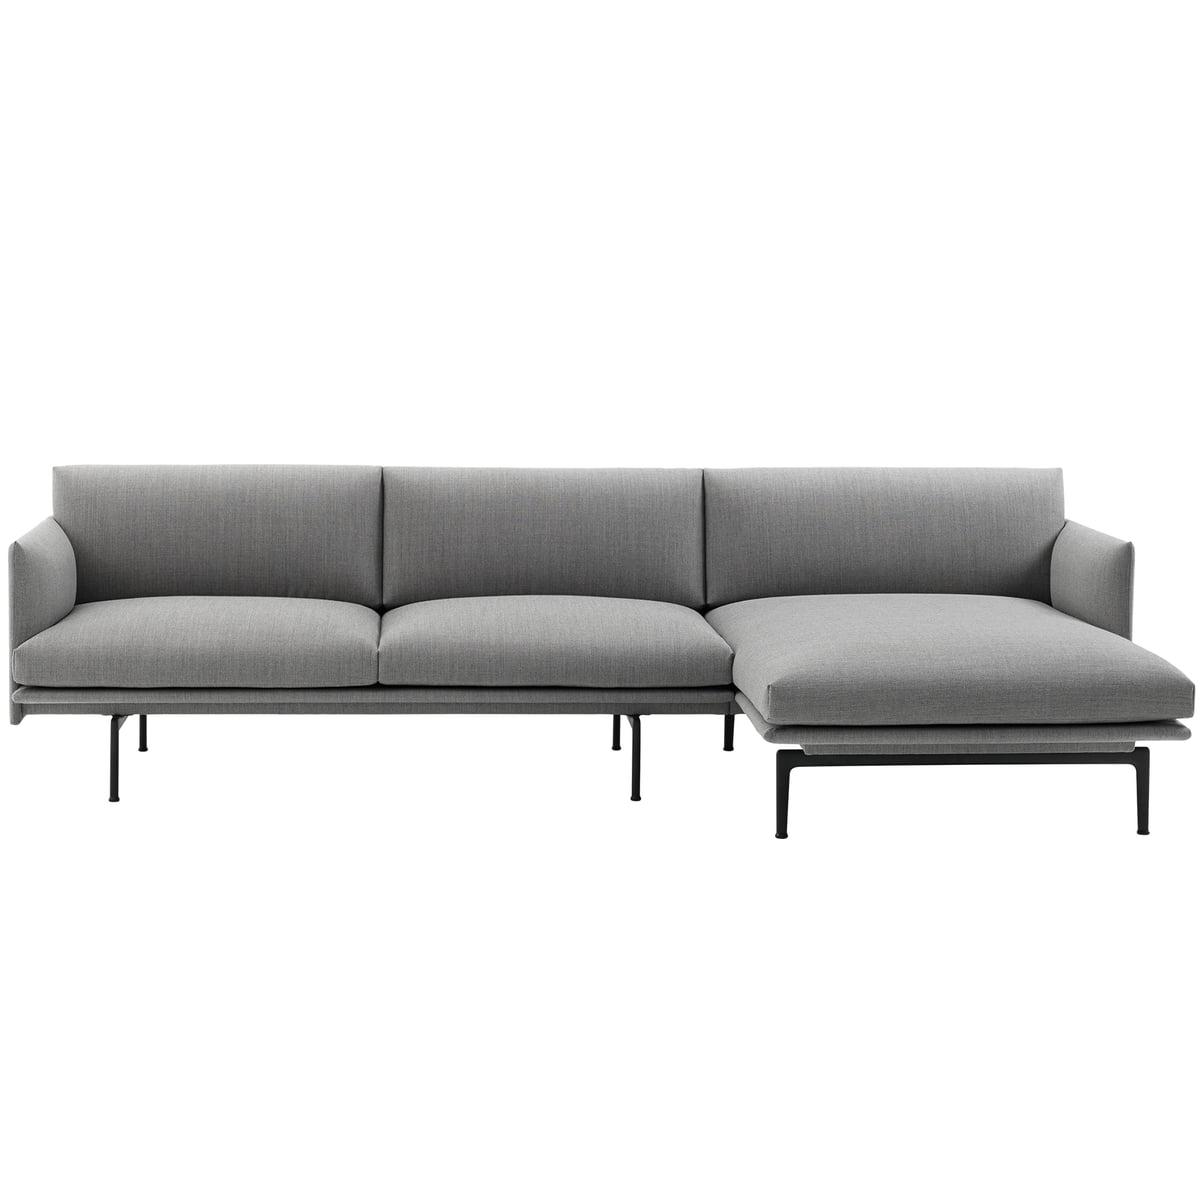 Sofa Chaiselongue O2d5 Outline Chaise Longue sofa by Muuto Connox